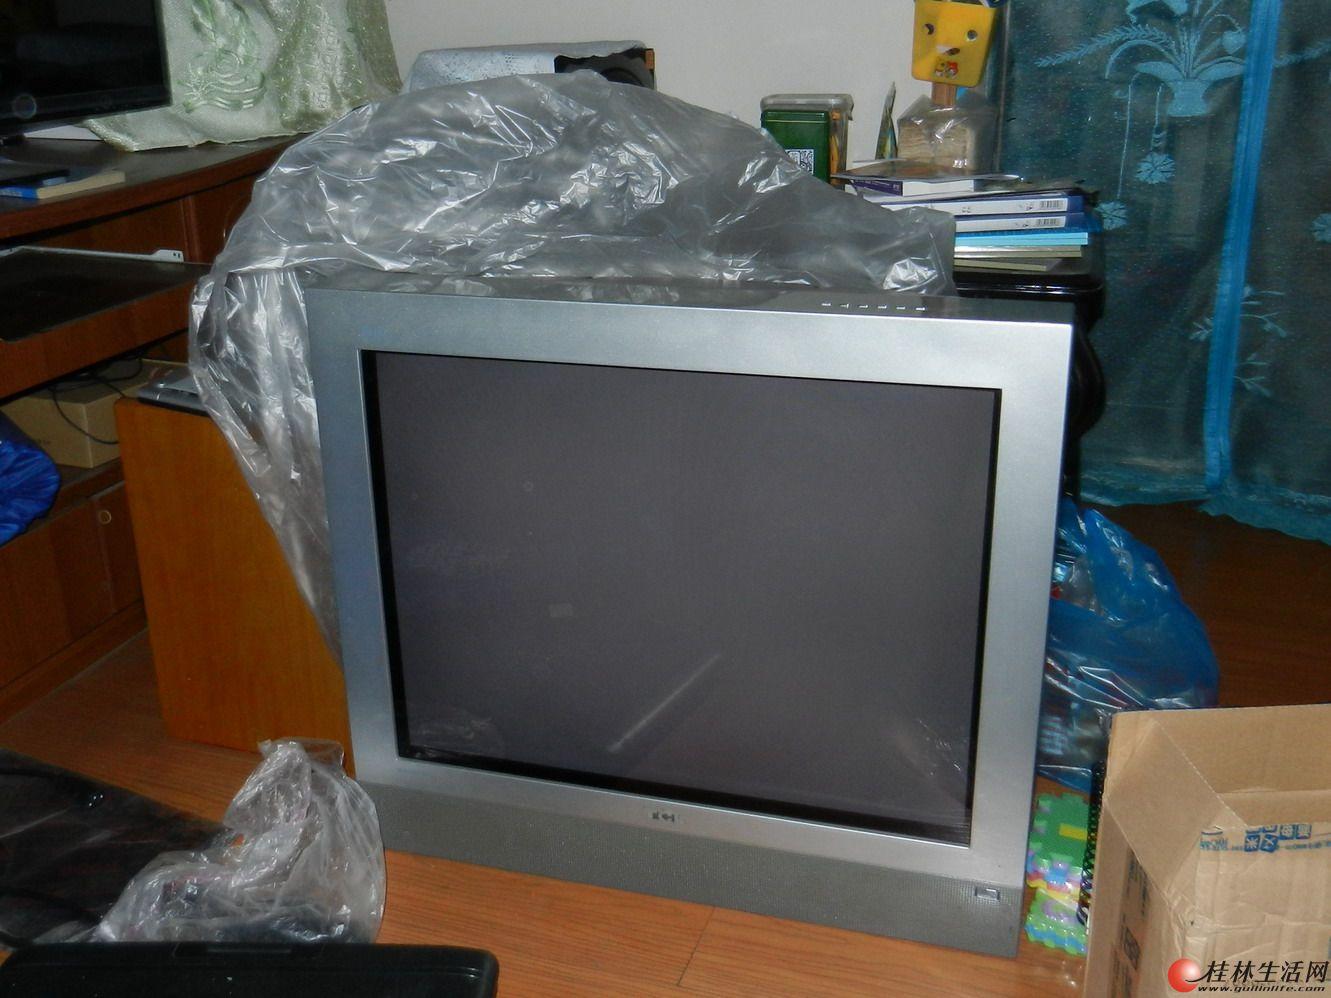 tcl29寸 台式电视机 外观新效果好